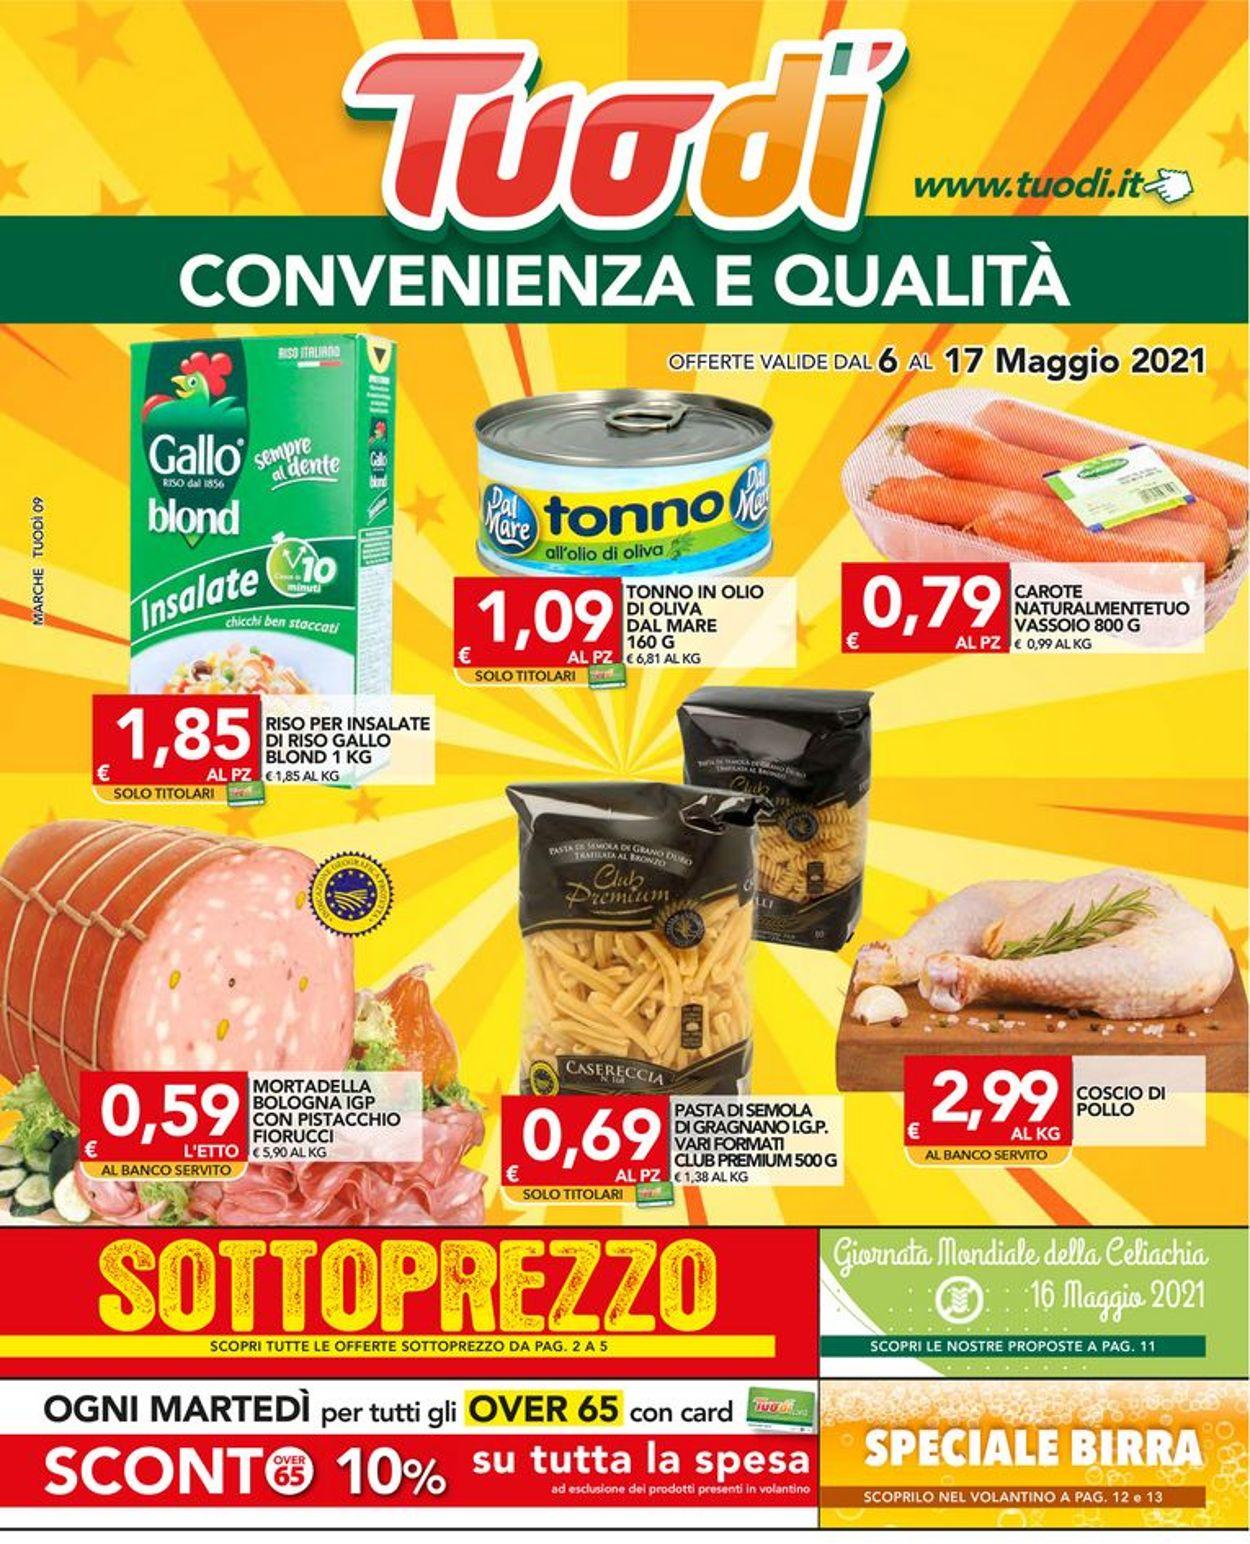 Volantino Tuodi - Offerte 06/05-17/05/2021